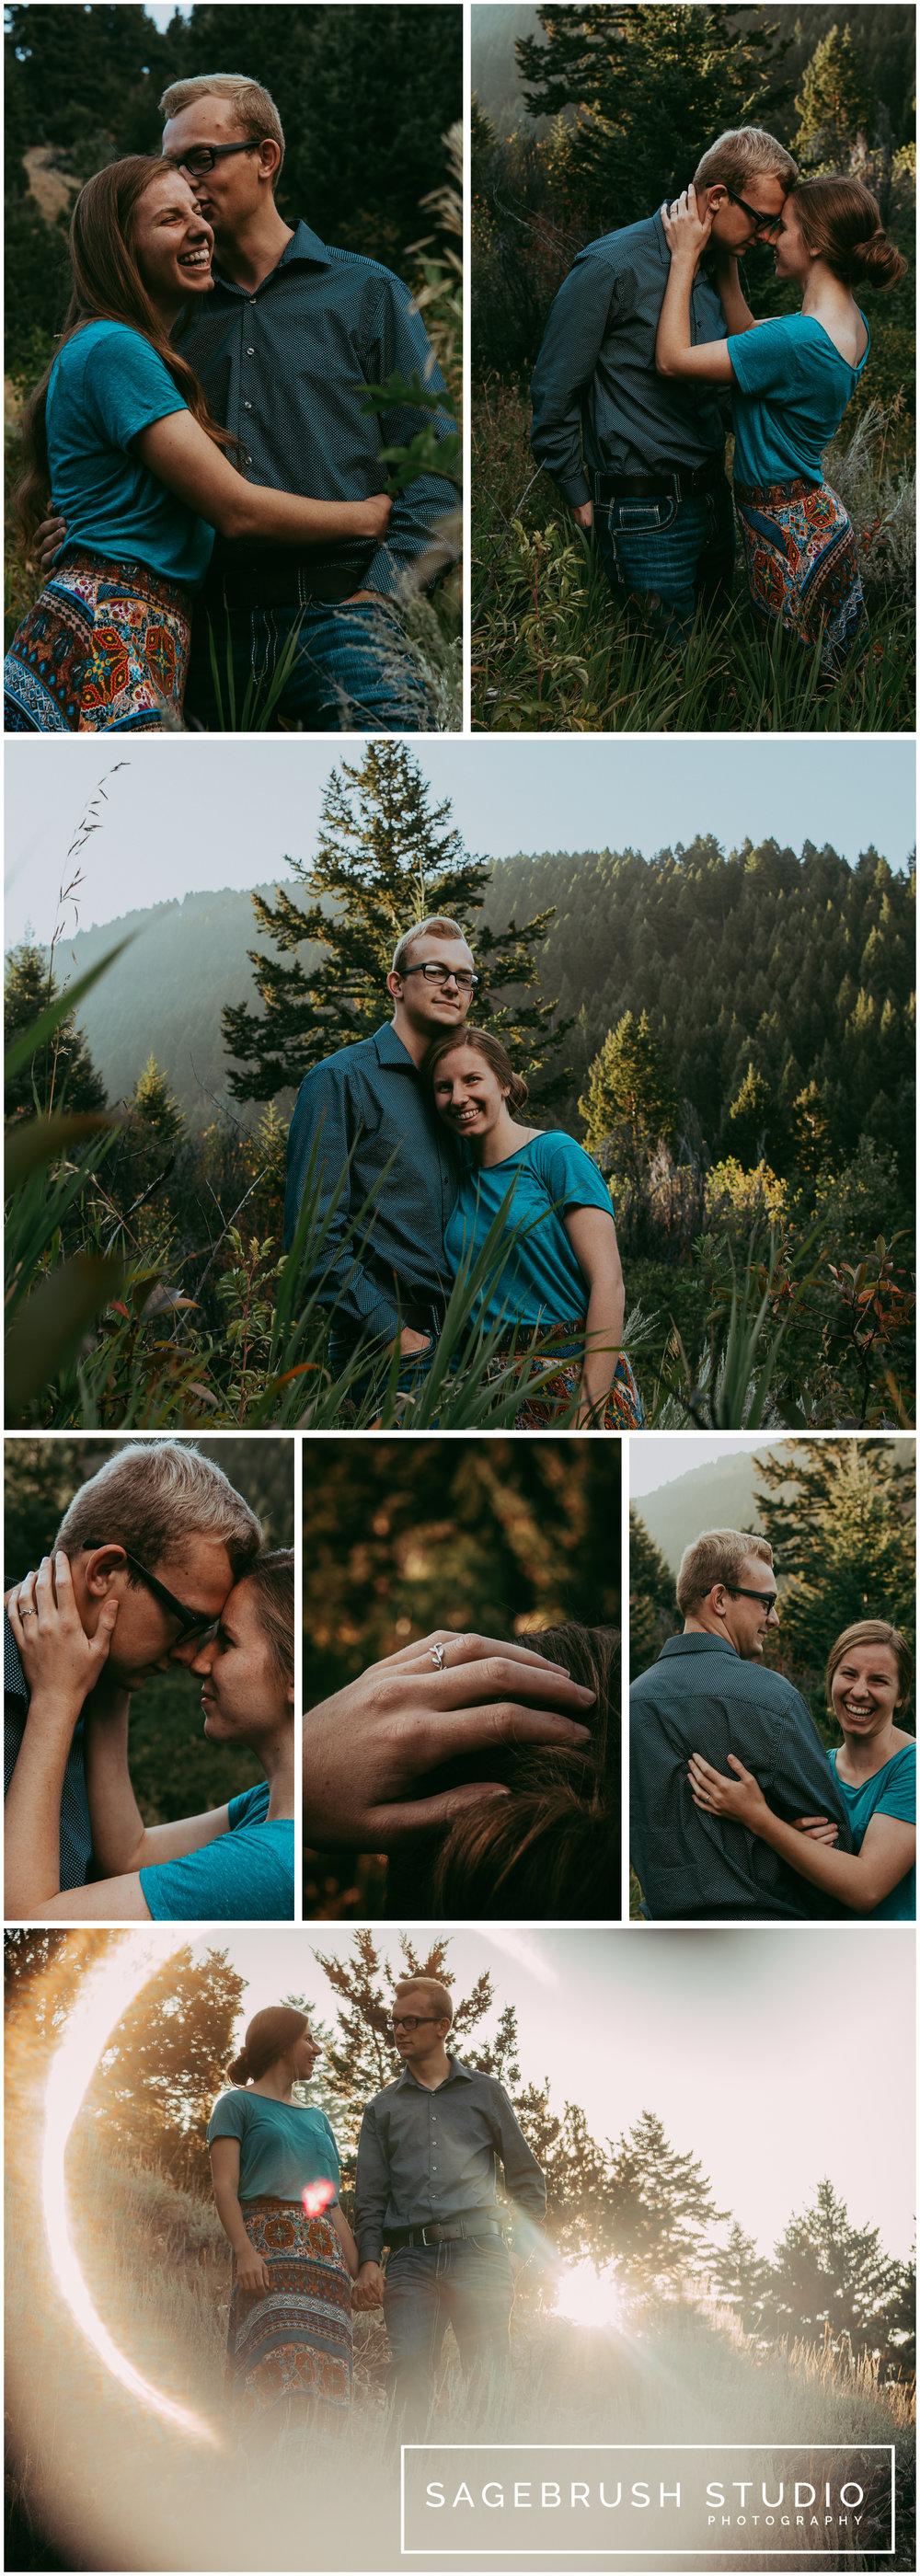 Tim & Marissa Engagement Session. Sagebrush Studio Photography, Montana.